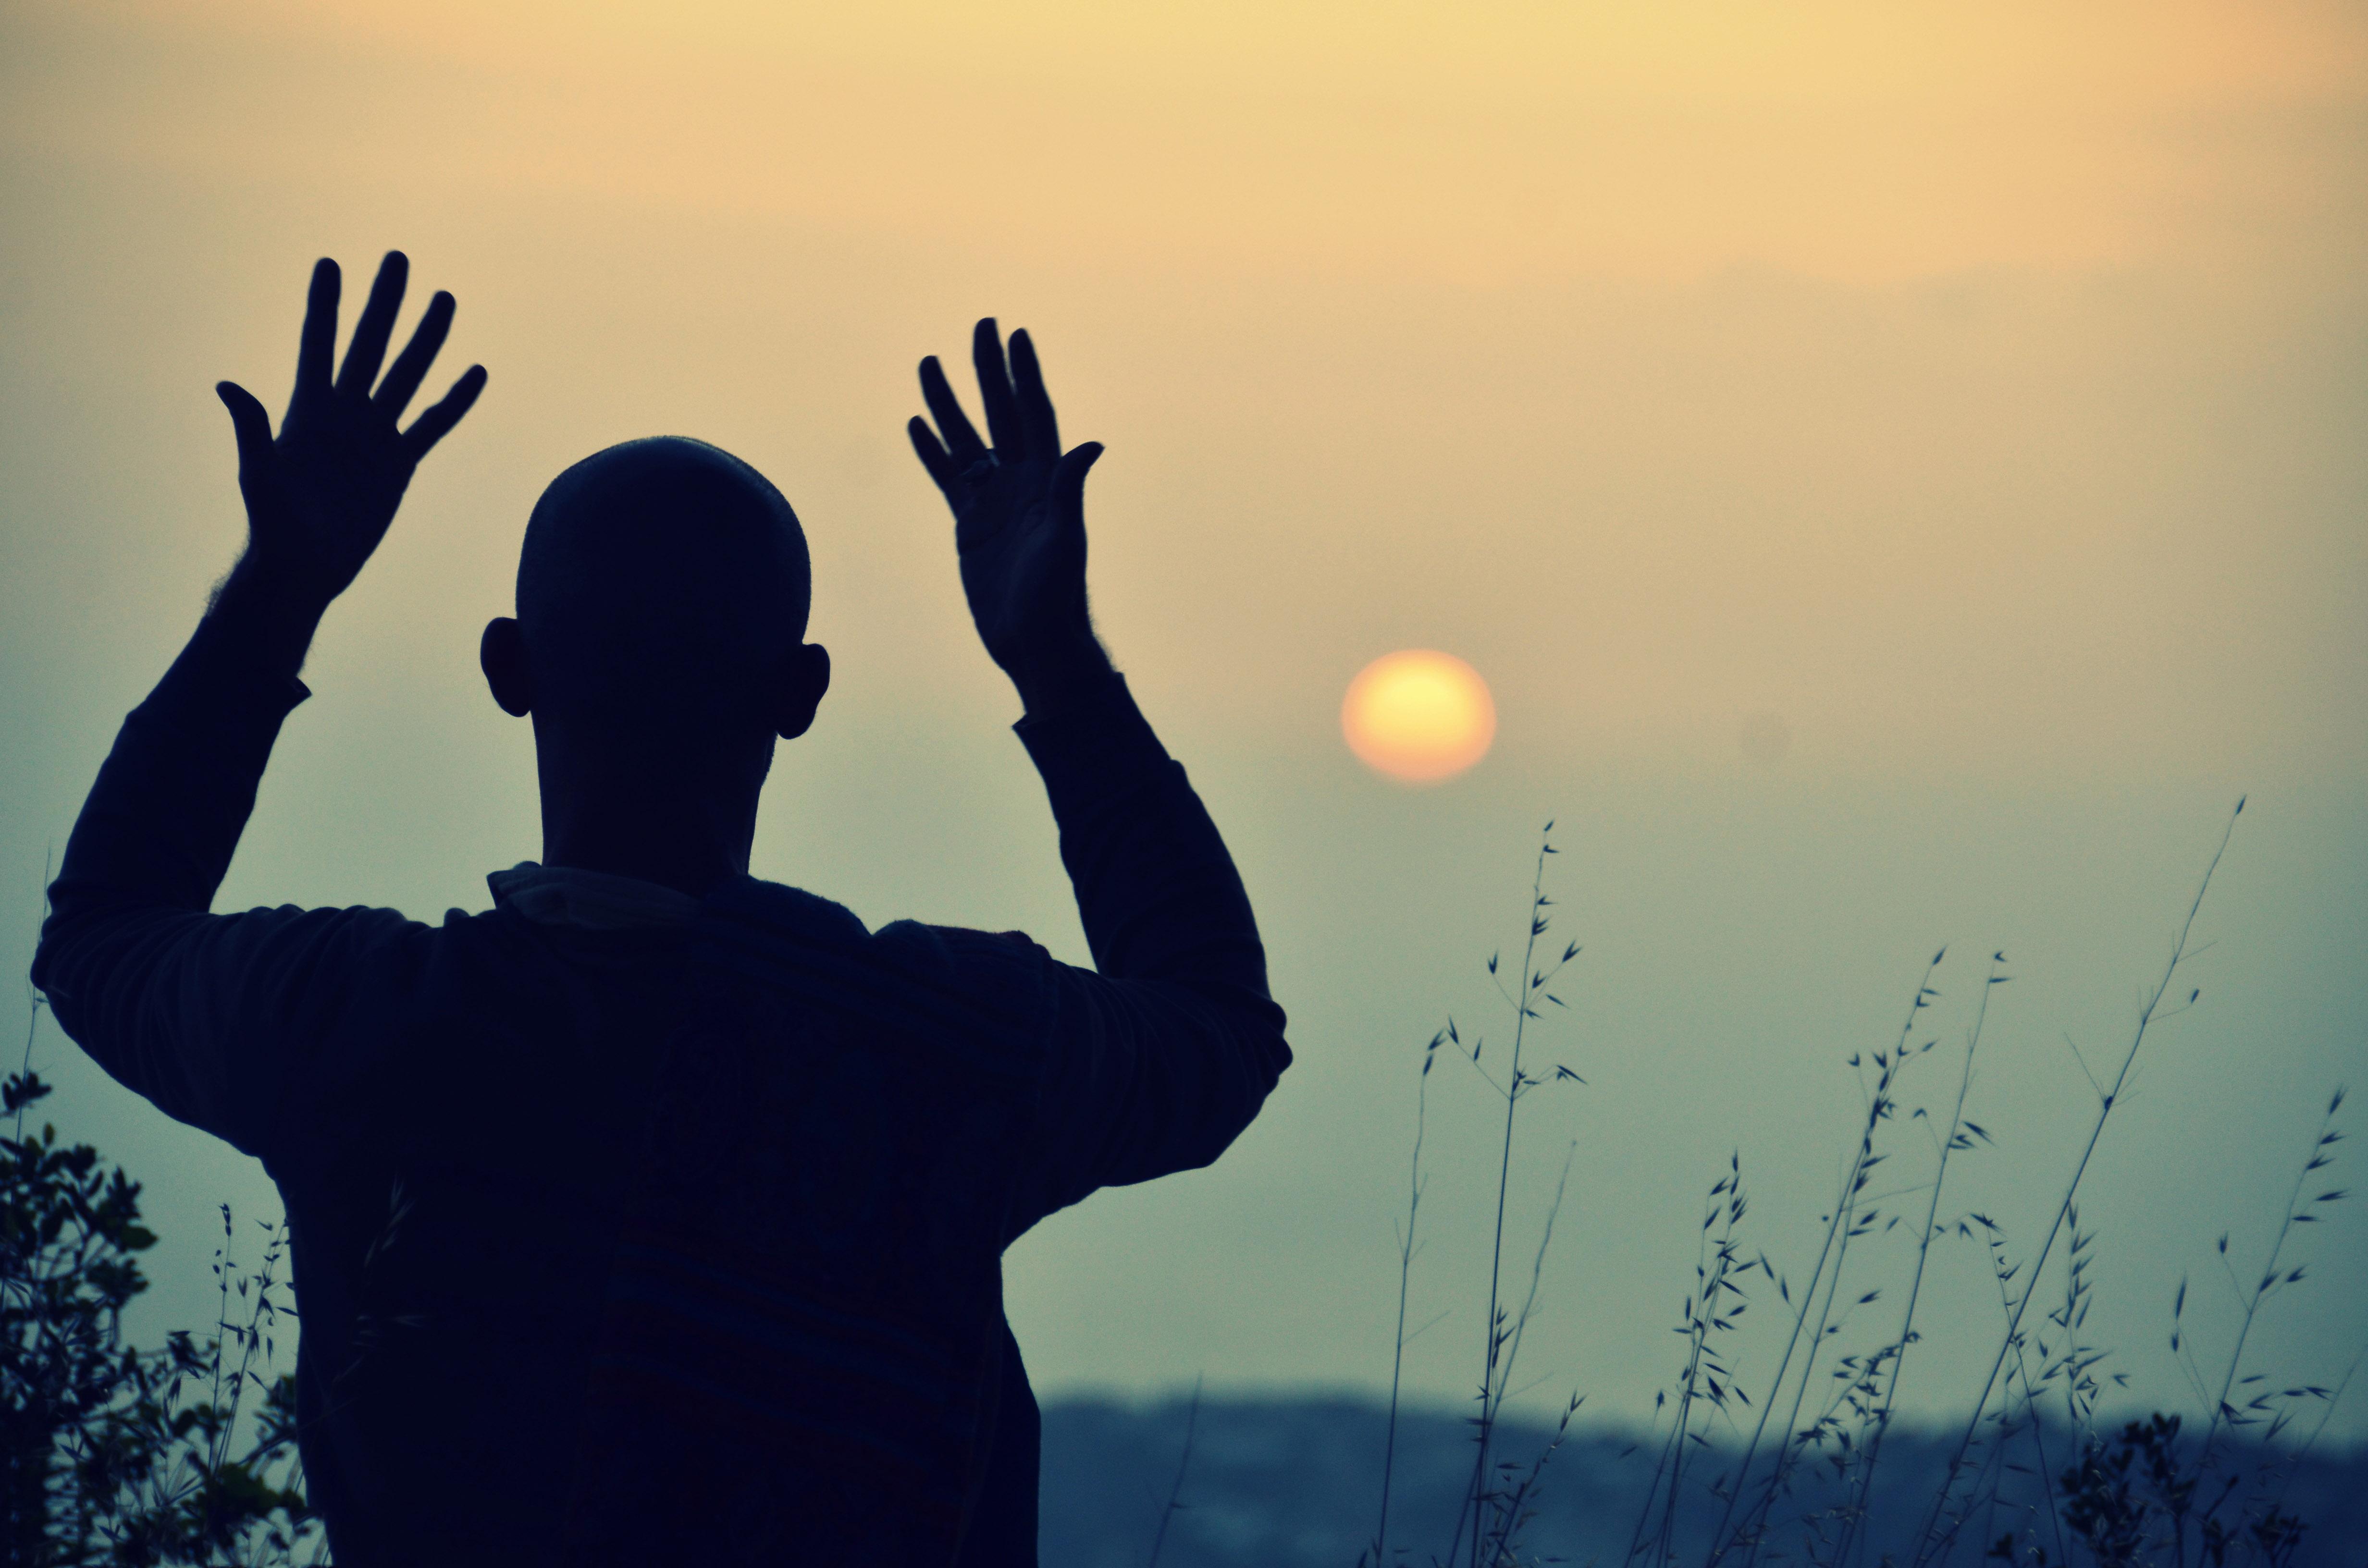 filosofia de vida segundo astrologia